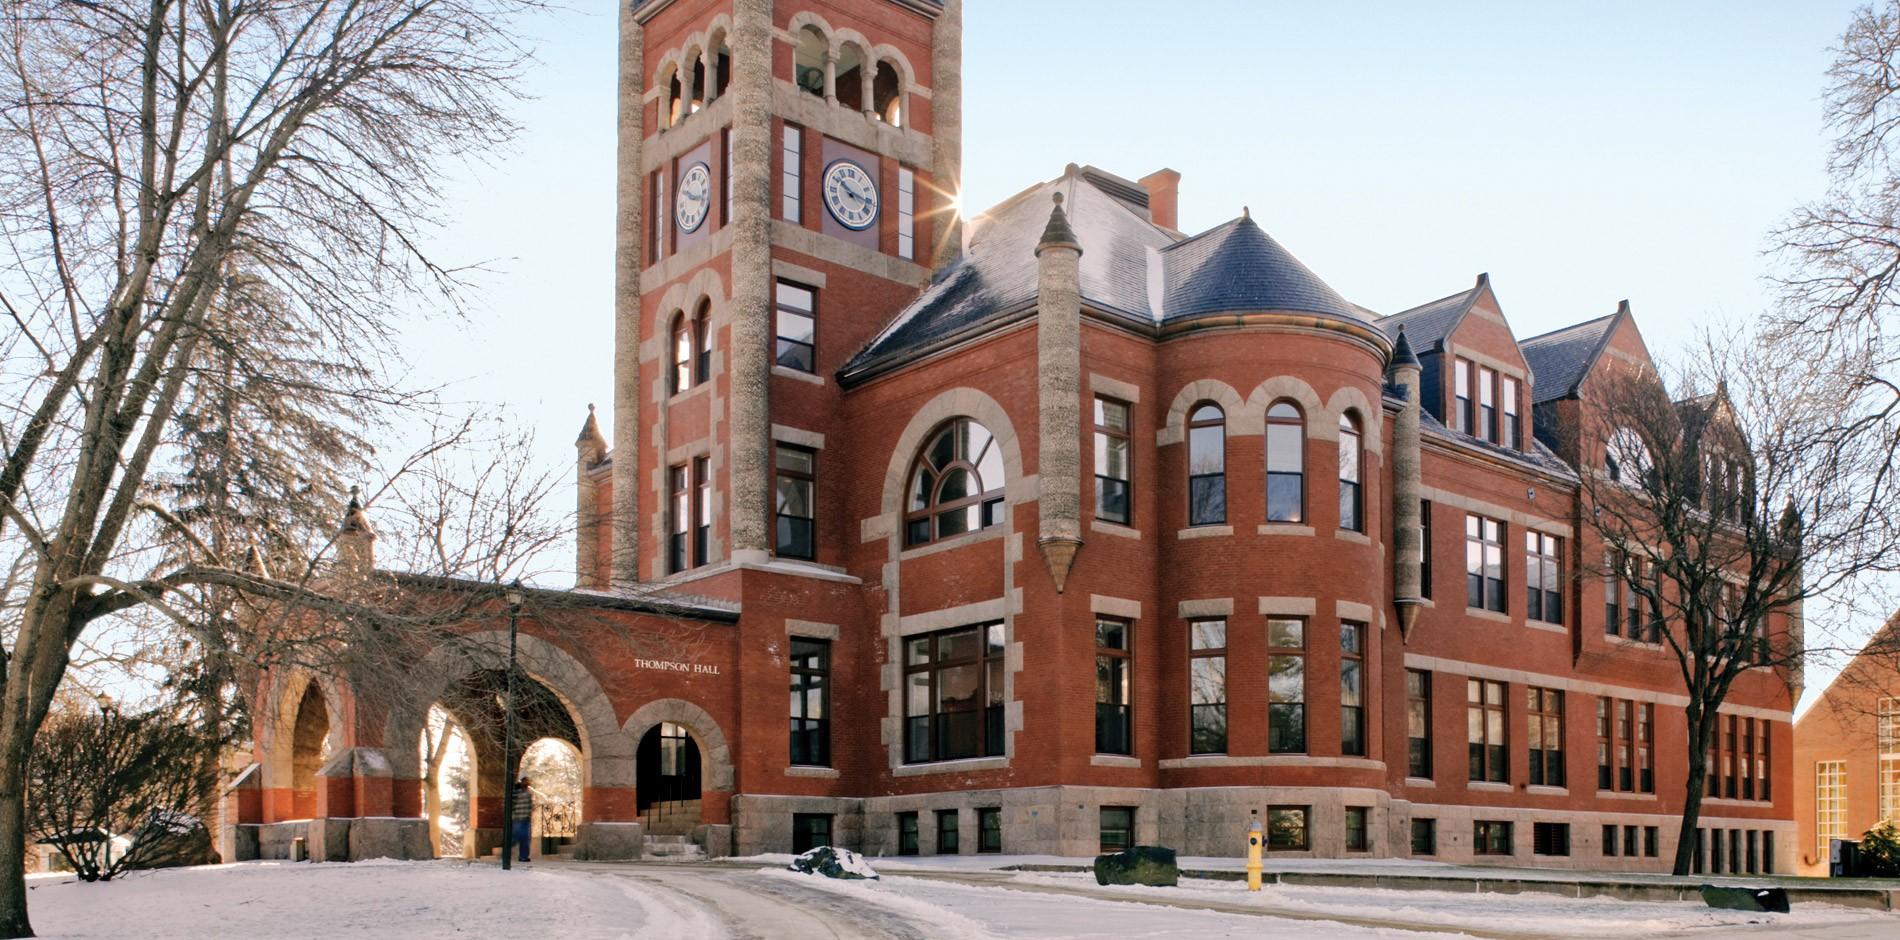 University of New Hampshire Main Campus - Net Price